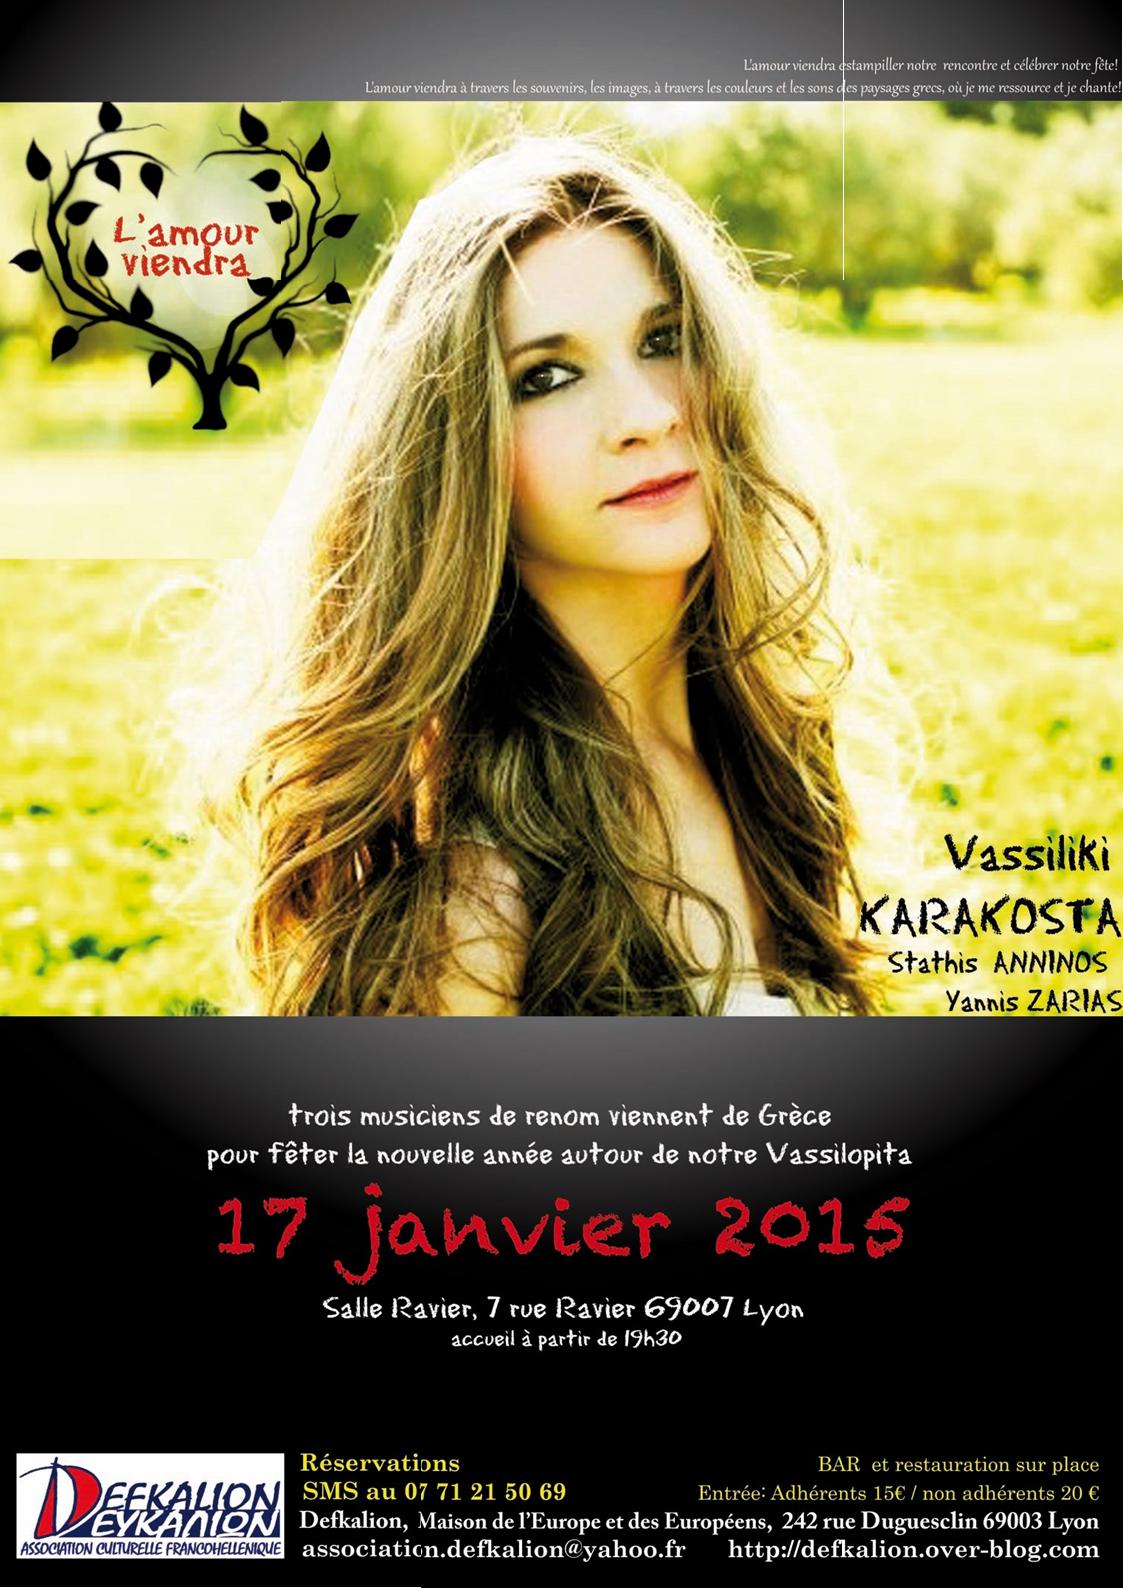 samedi 17 janvier 2015 - Vasiliki Karakosta